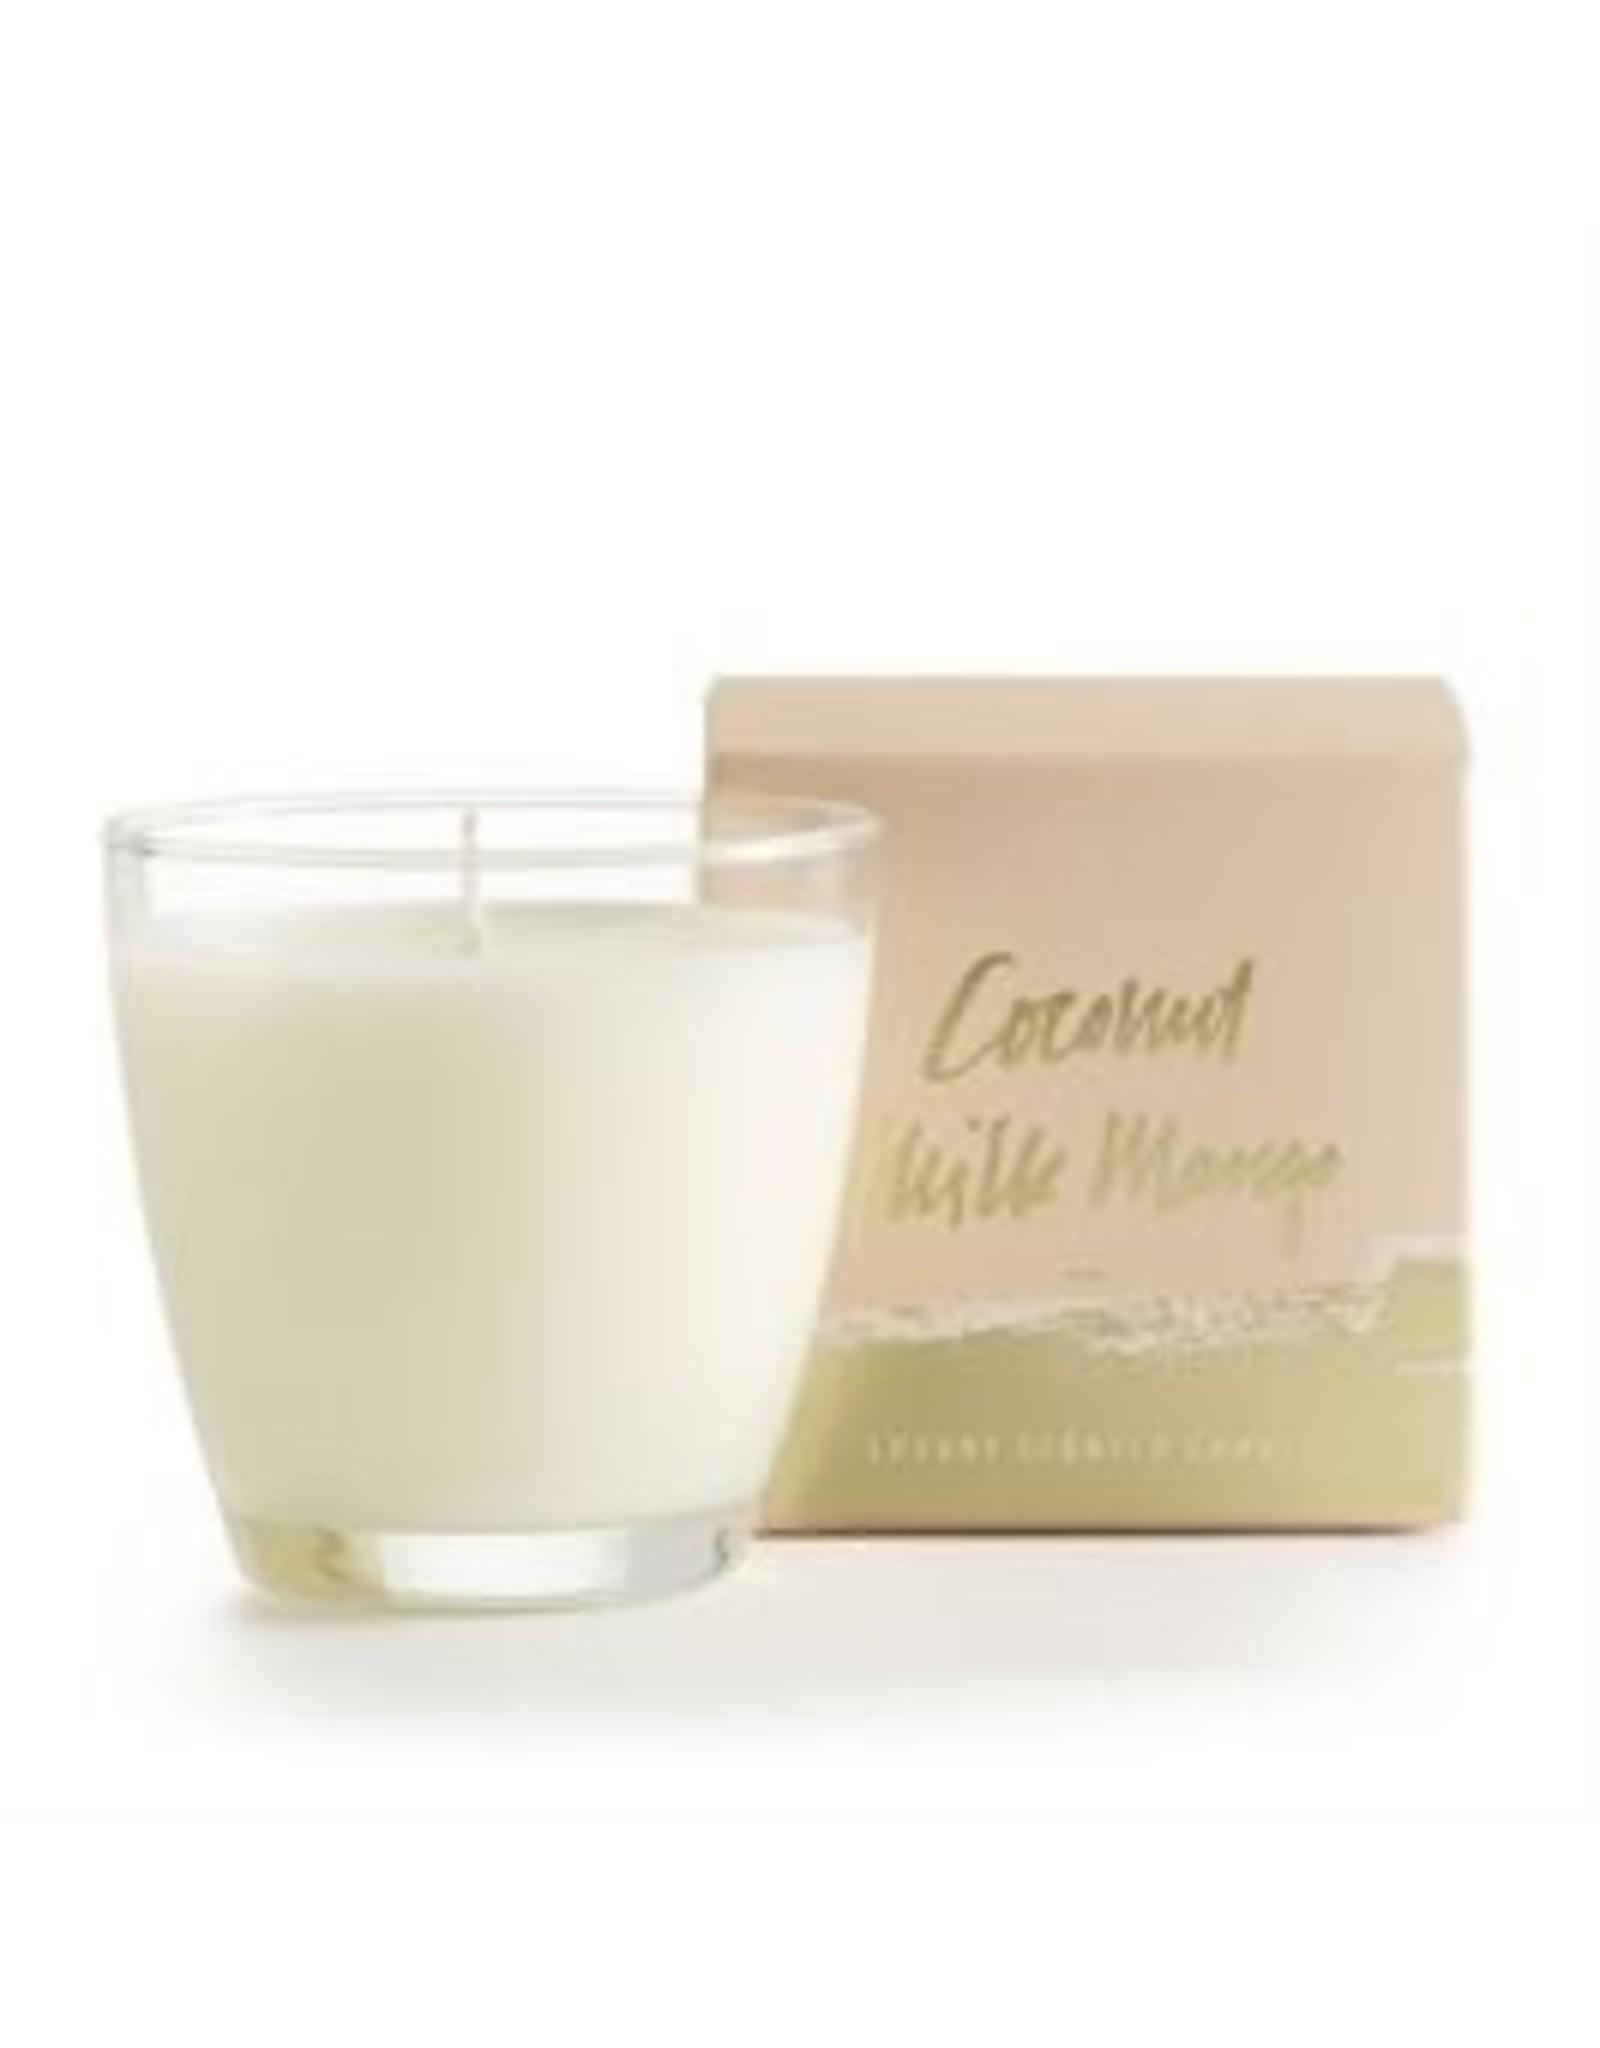 Illume Coconut Milk Mango Glass Candle - 4.7oz